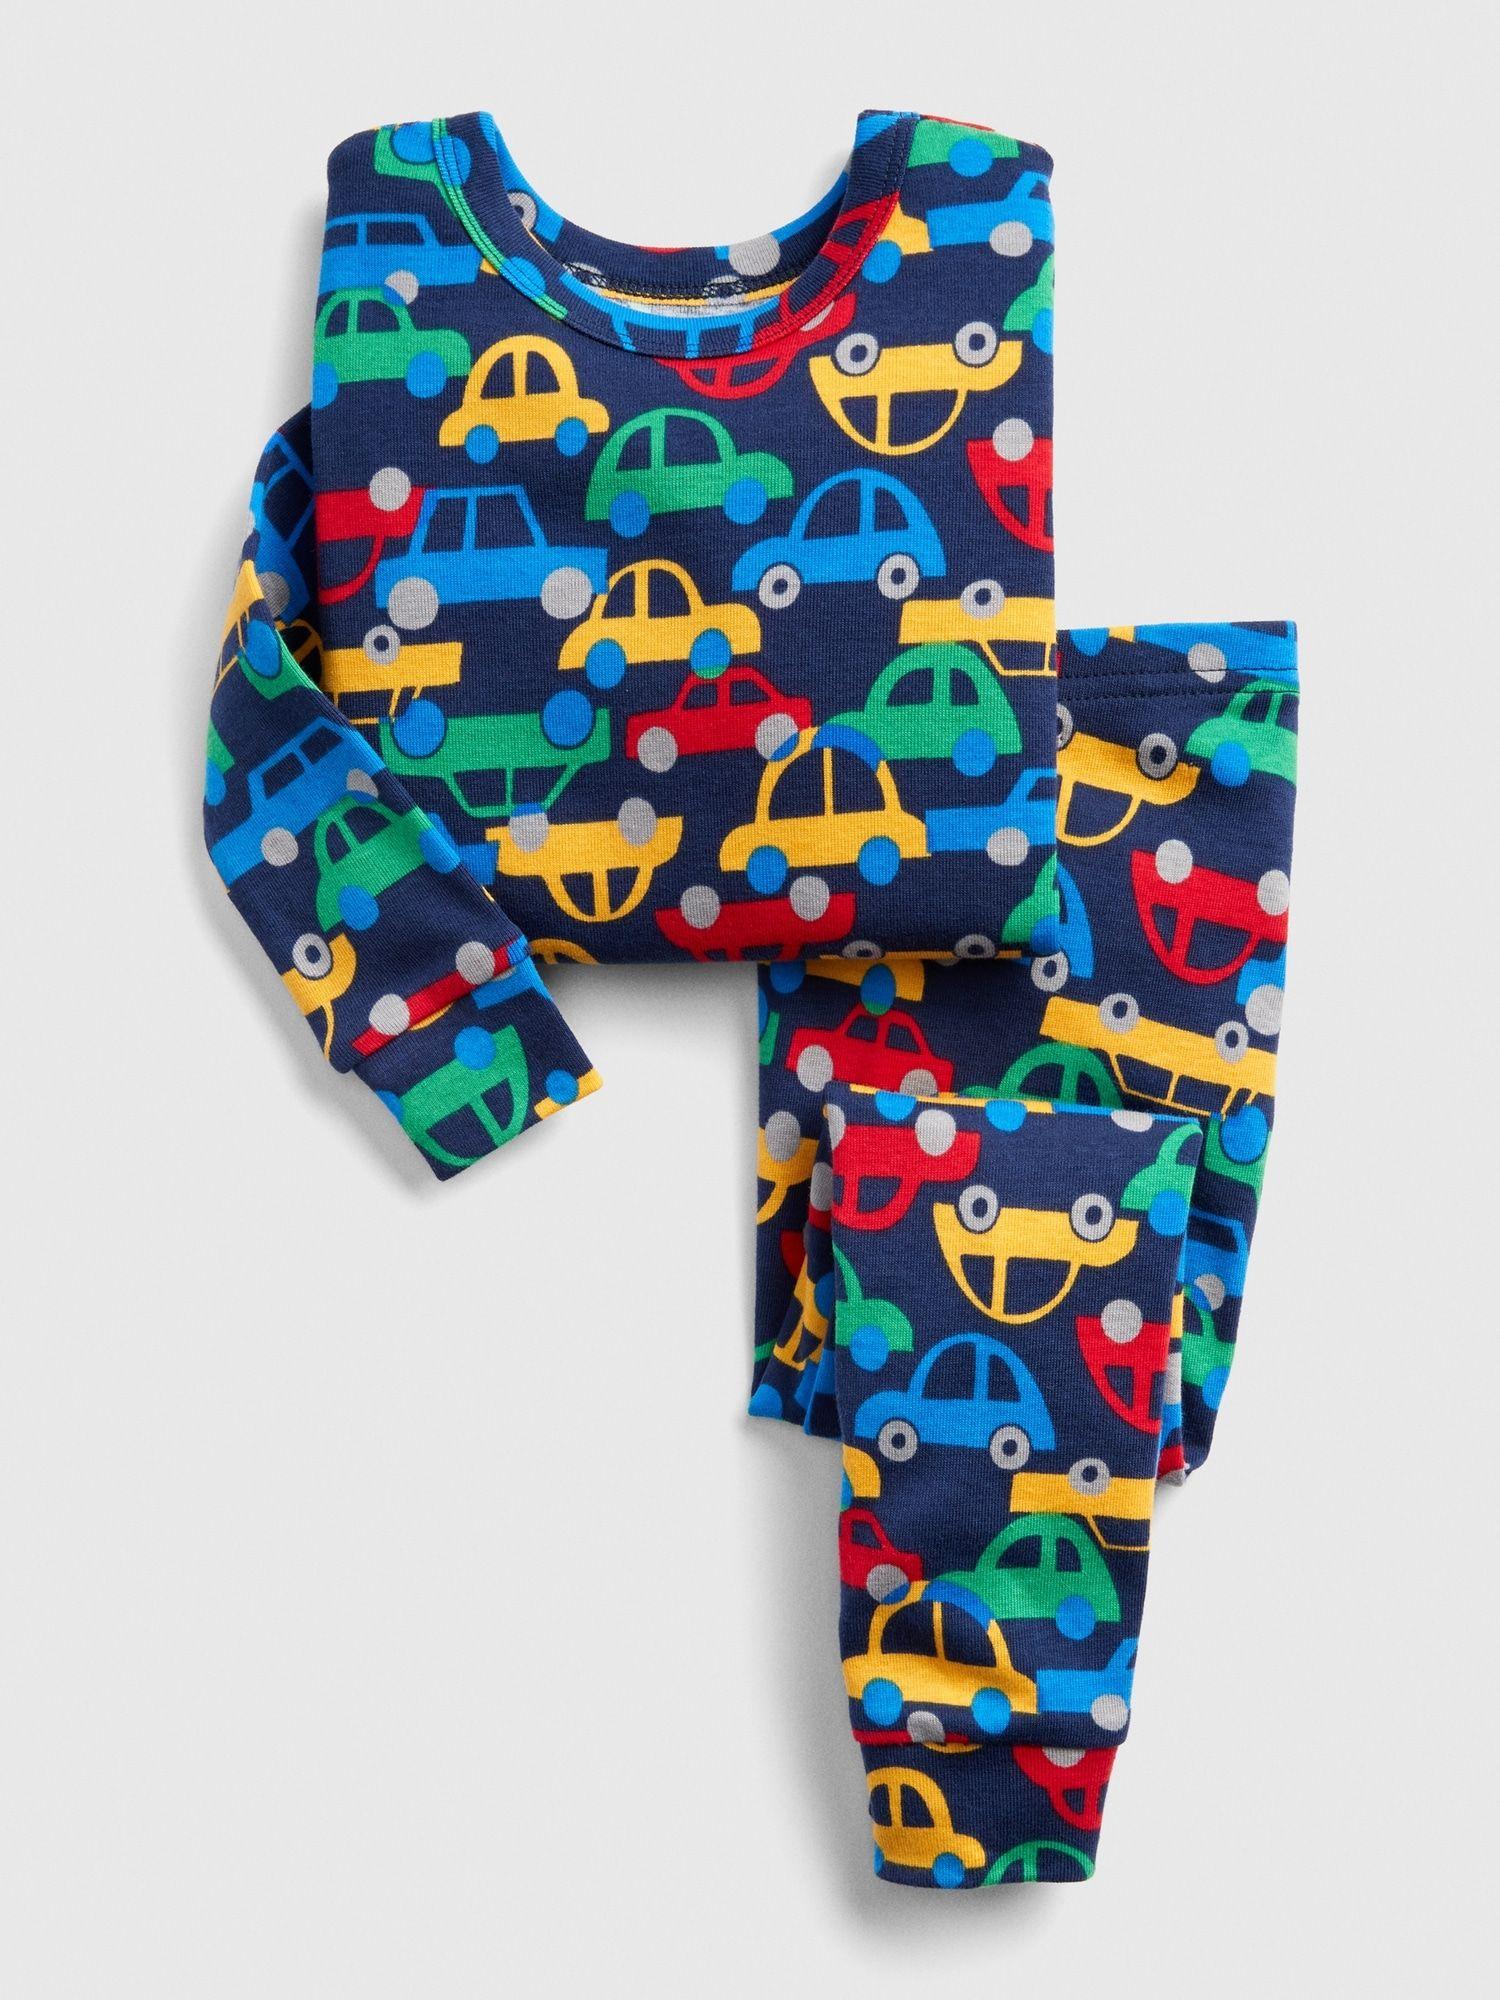 NWT BABY GAP BOYS PAJAMAS PJS  shorts summer dino dinosaurs   u pick size